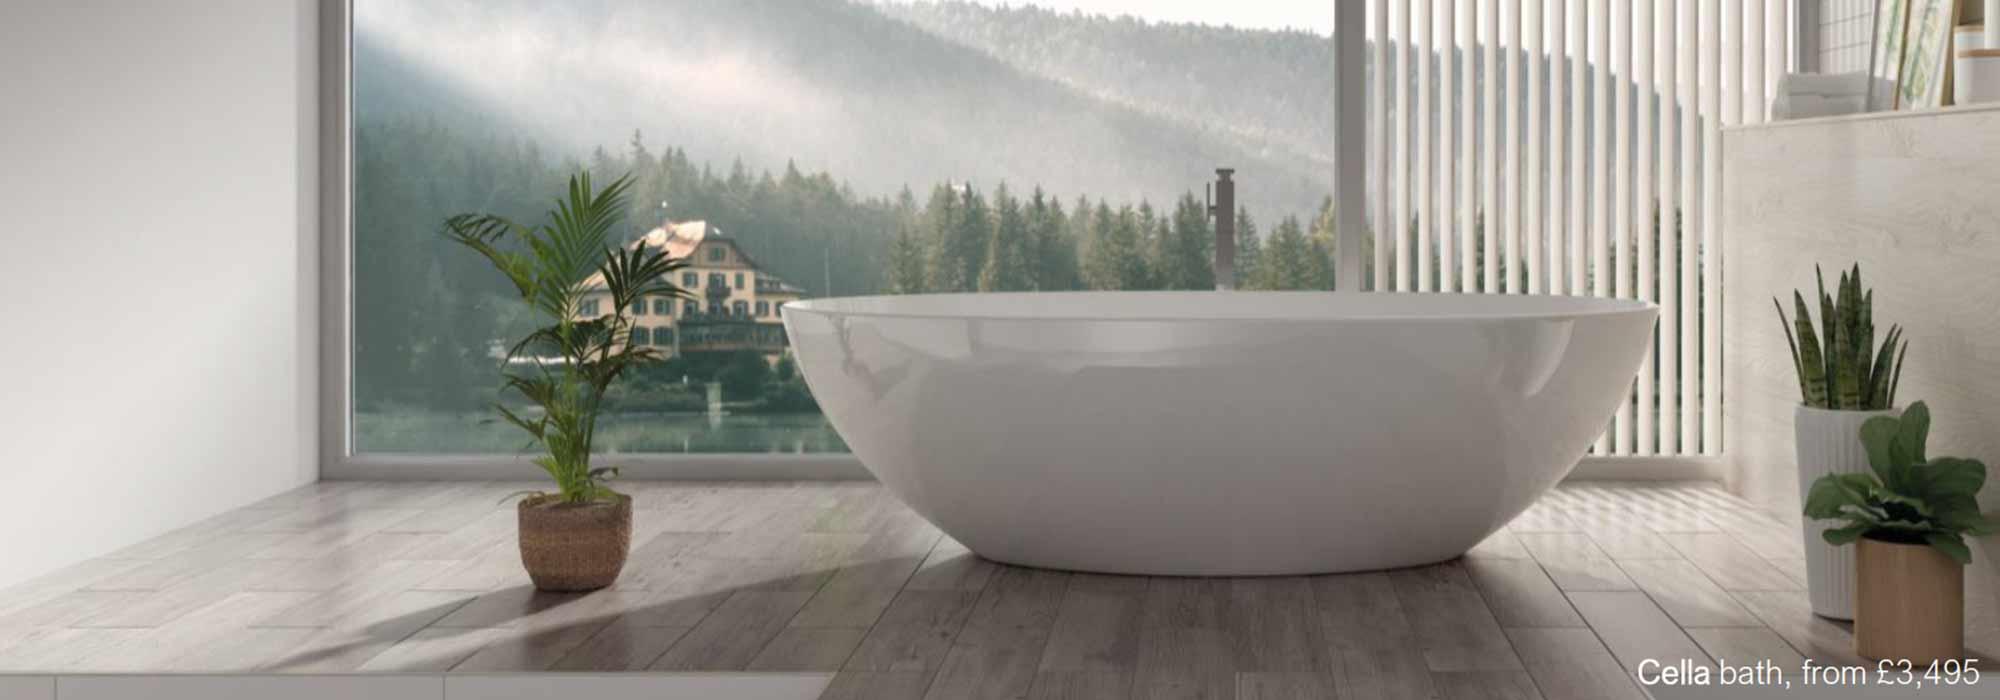 Choosing the right freestanding bath